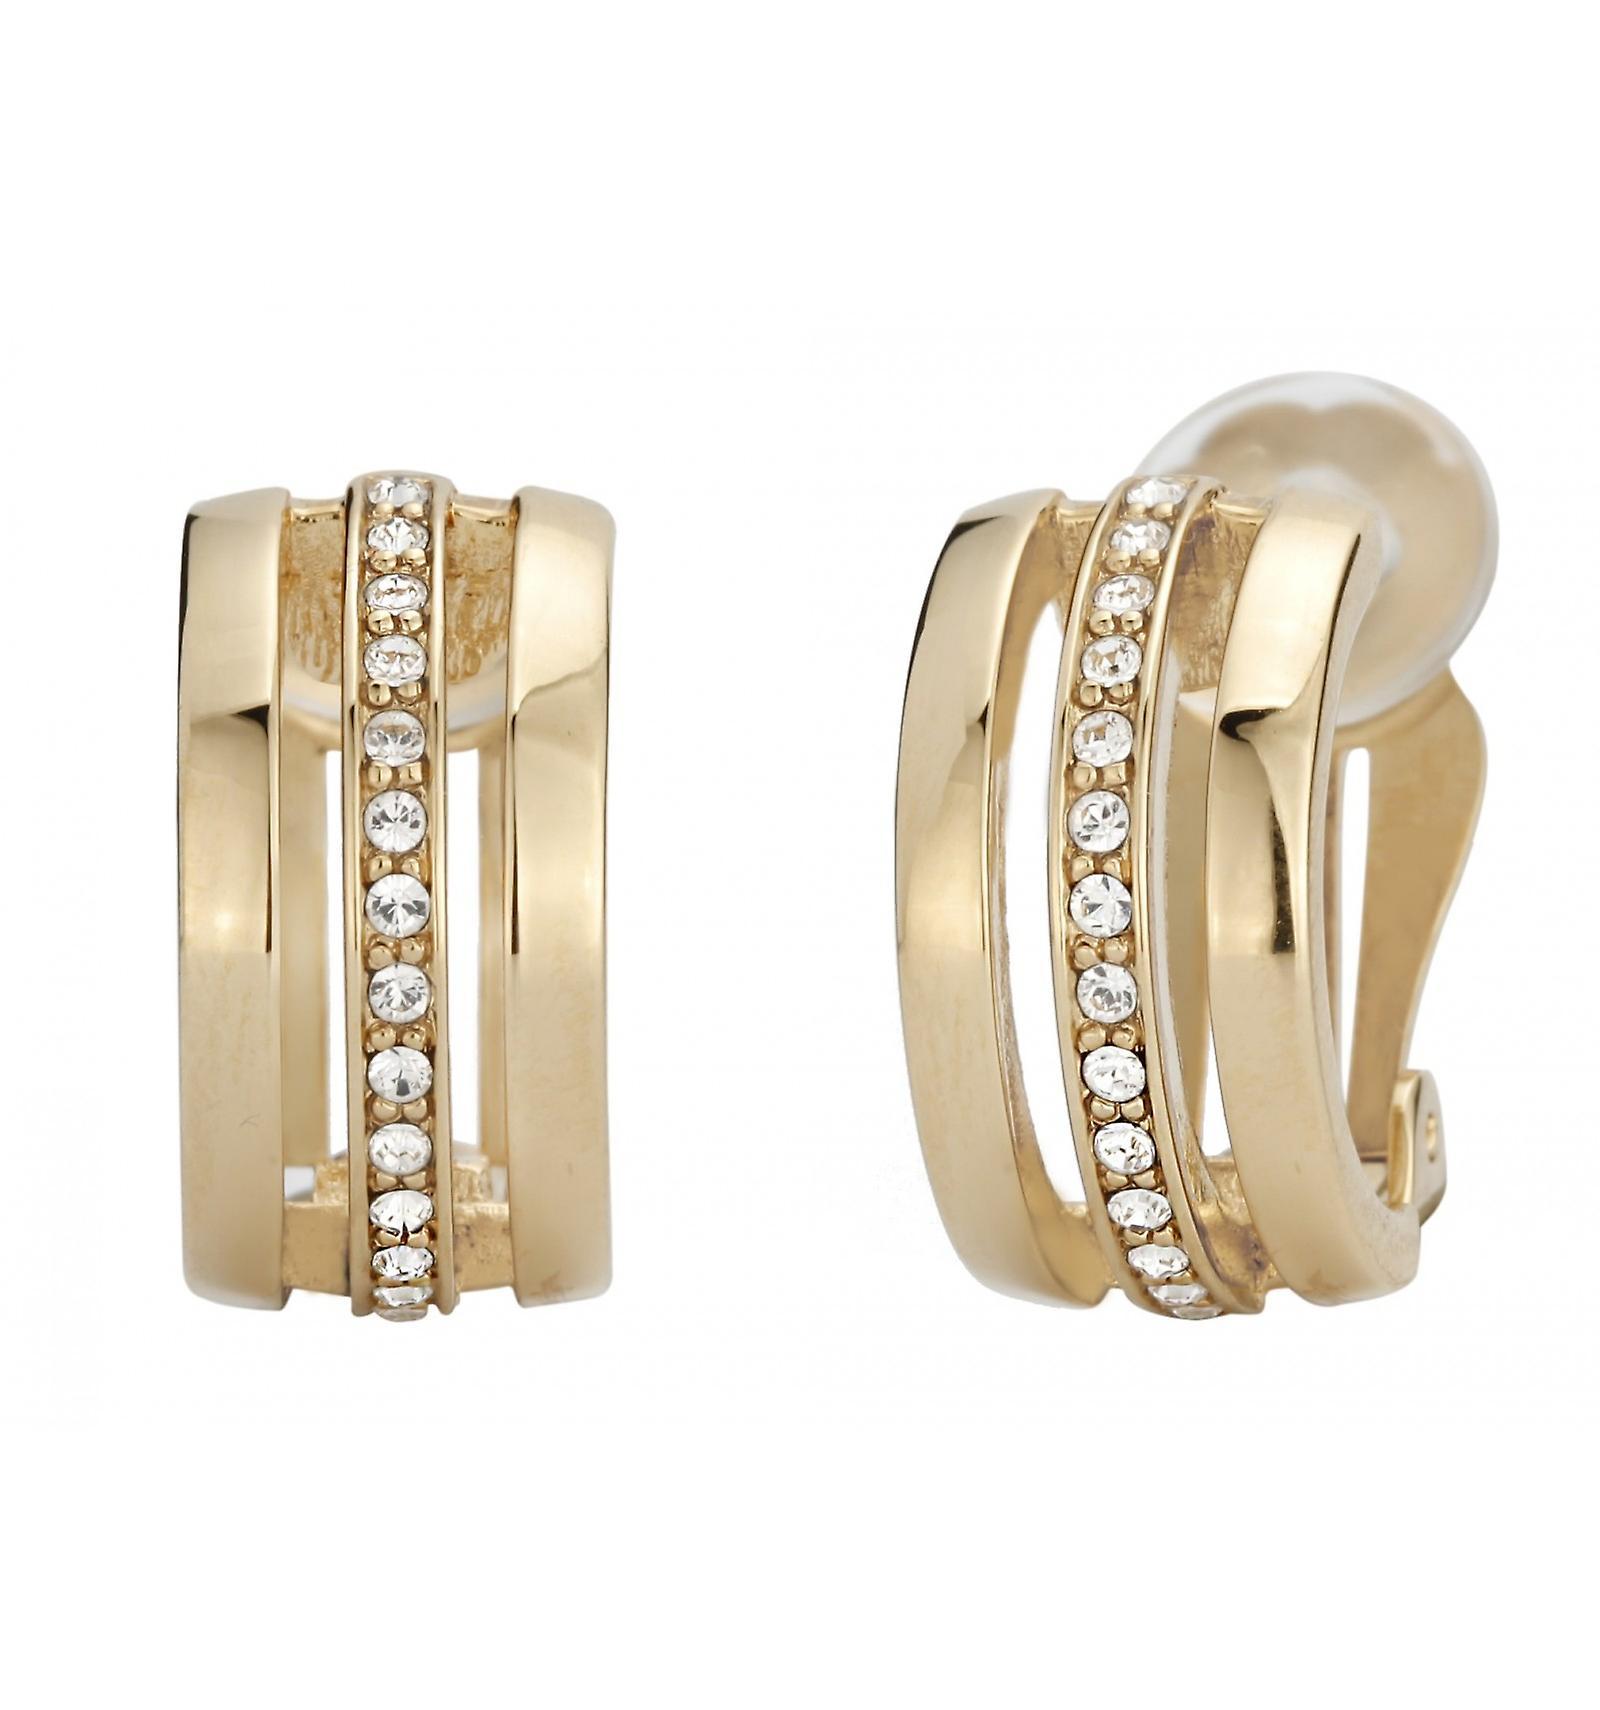 Reiziger clip Earring-22ct verguld-Swarovski kristallen-157081